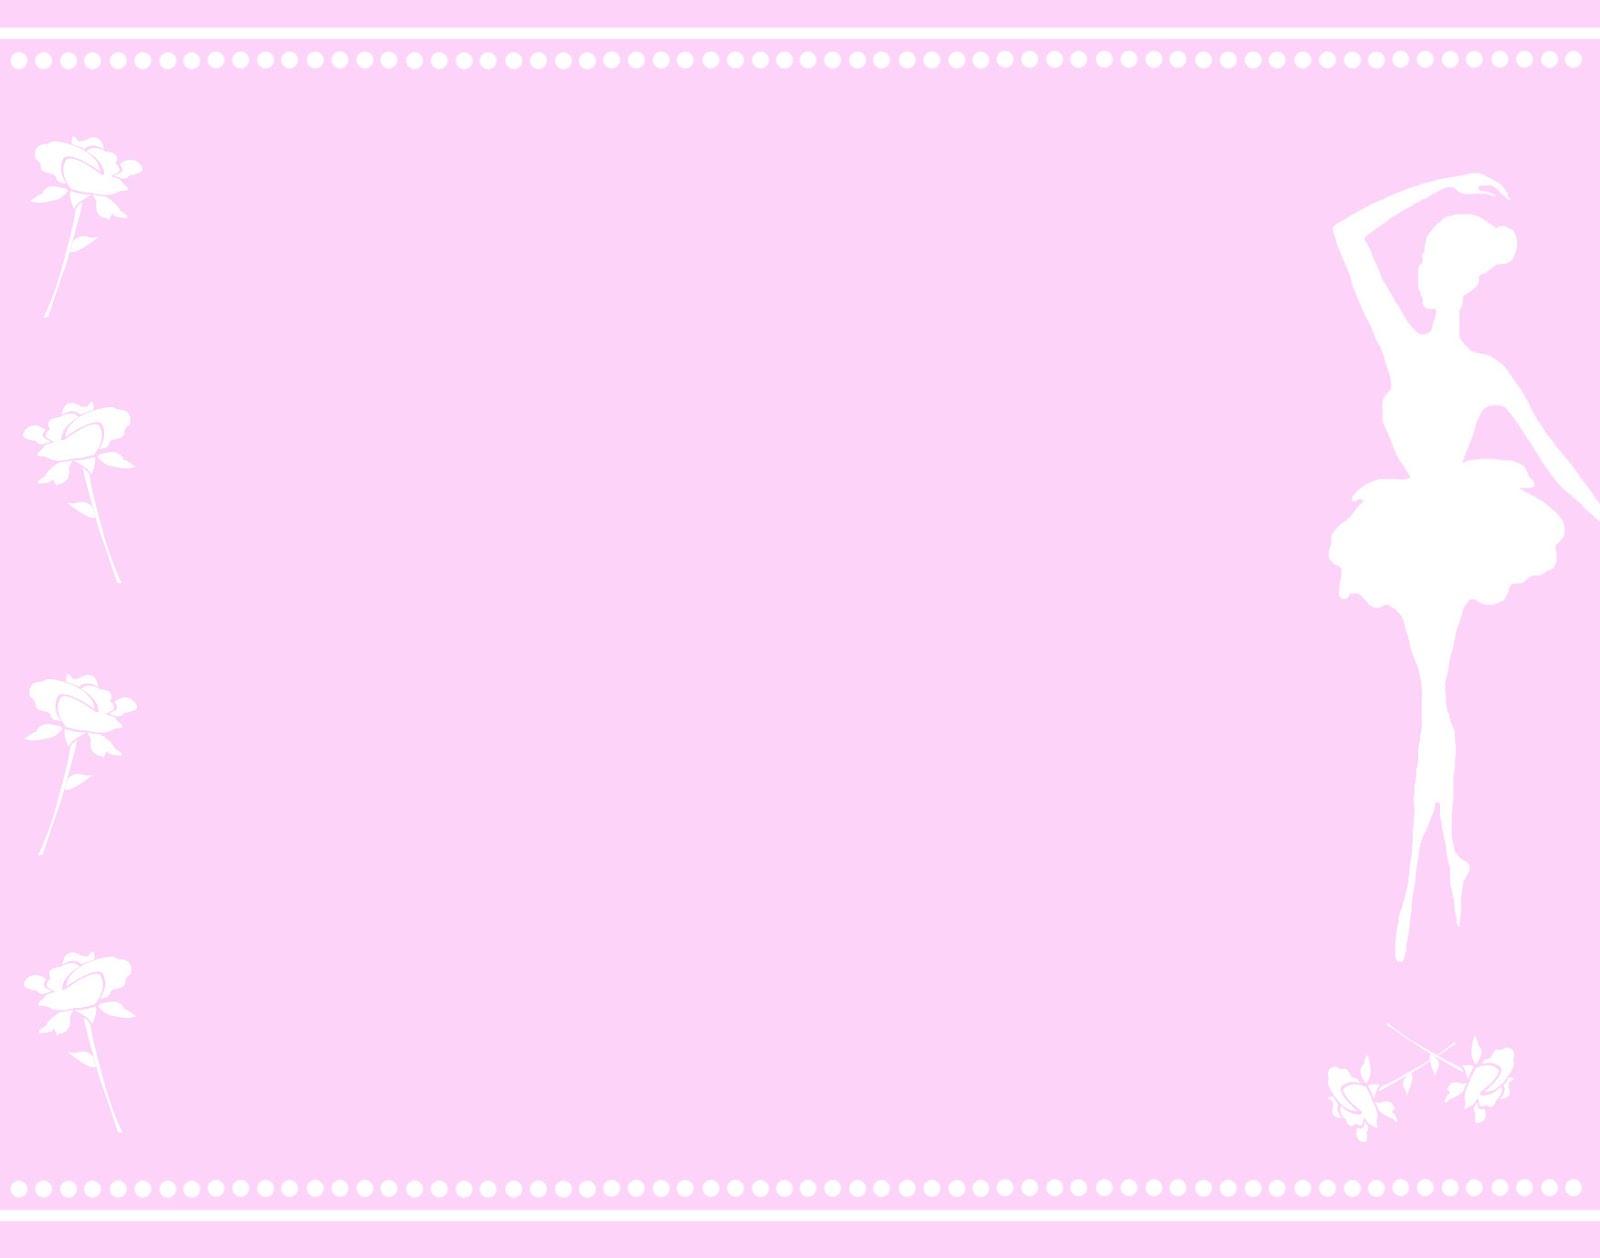 Background Lucu Warna Pink - Koleksi Gambar HD